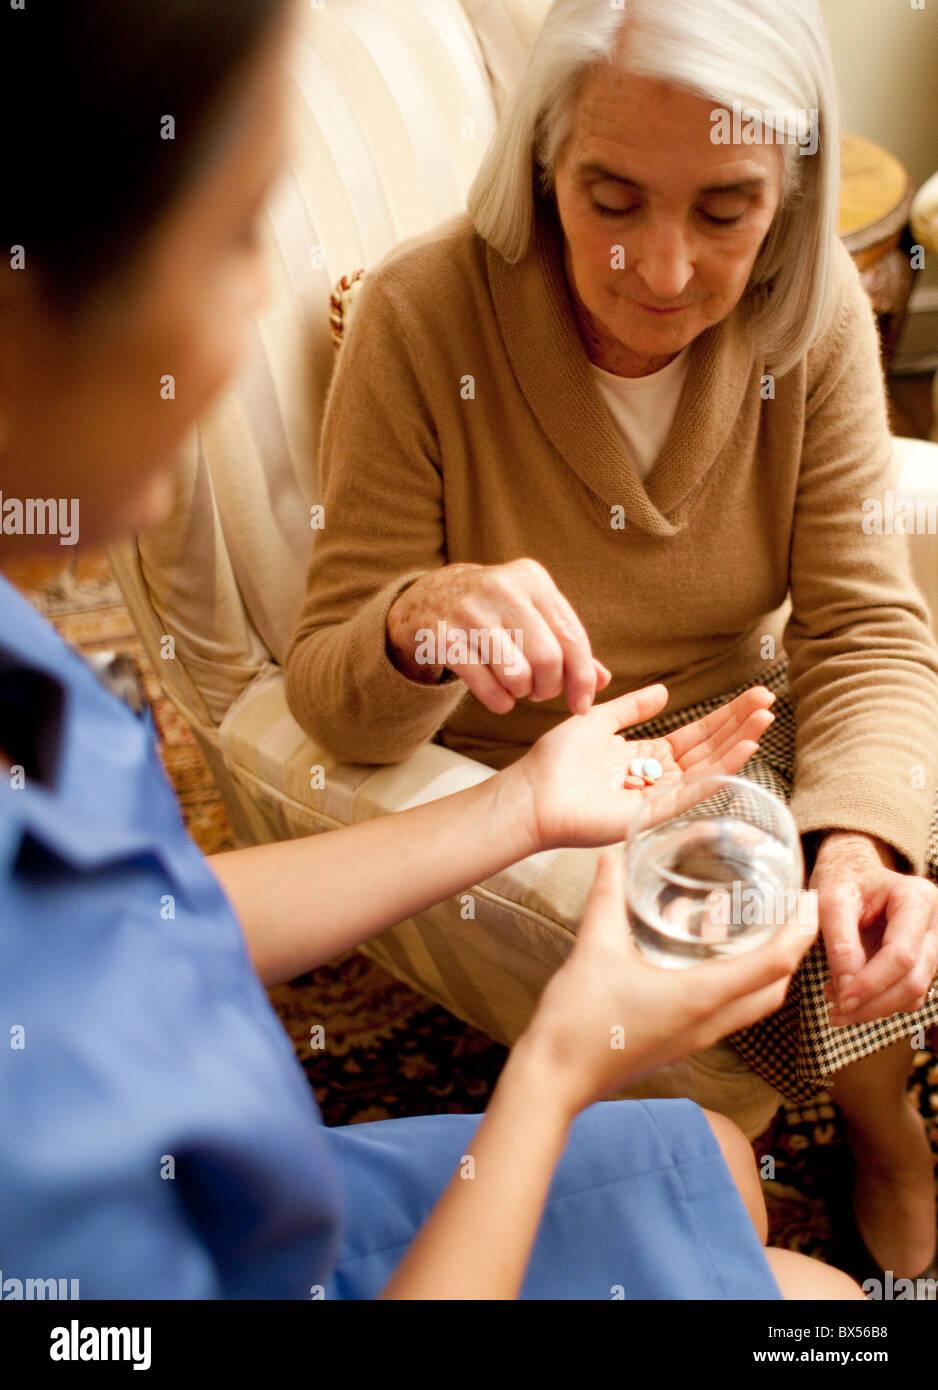 Taking medication - Stock Image